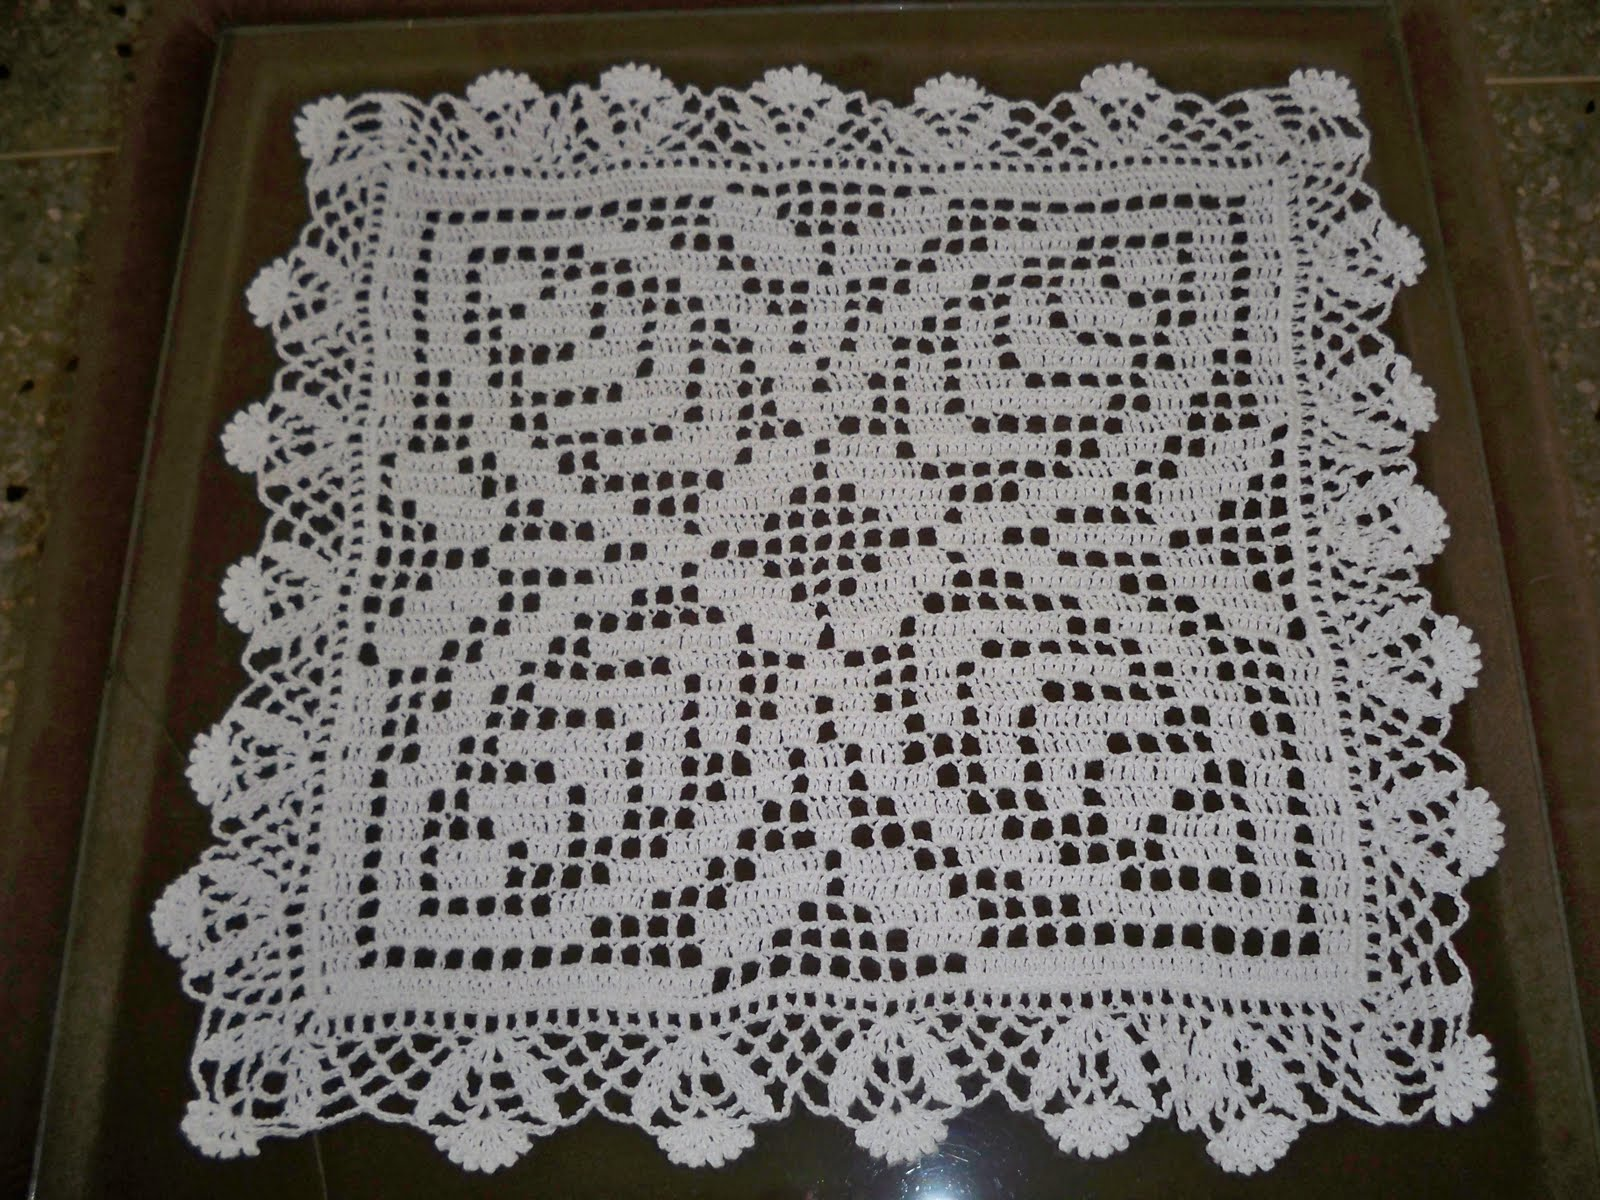 Pin tapetes tejidos a crochet portal genuardis pelautscom for Tapetes de crochet